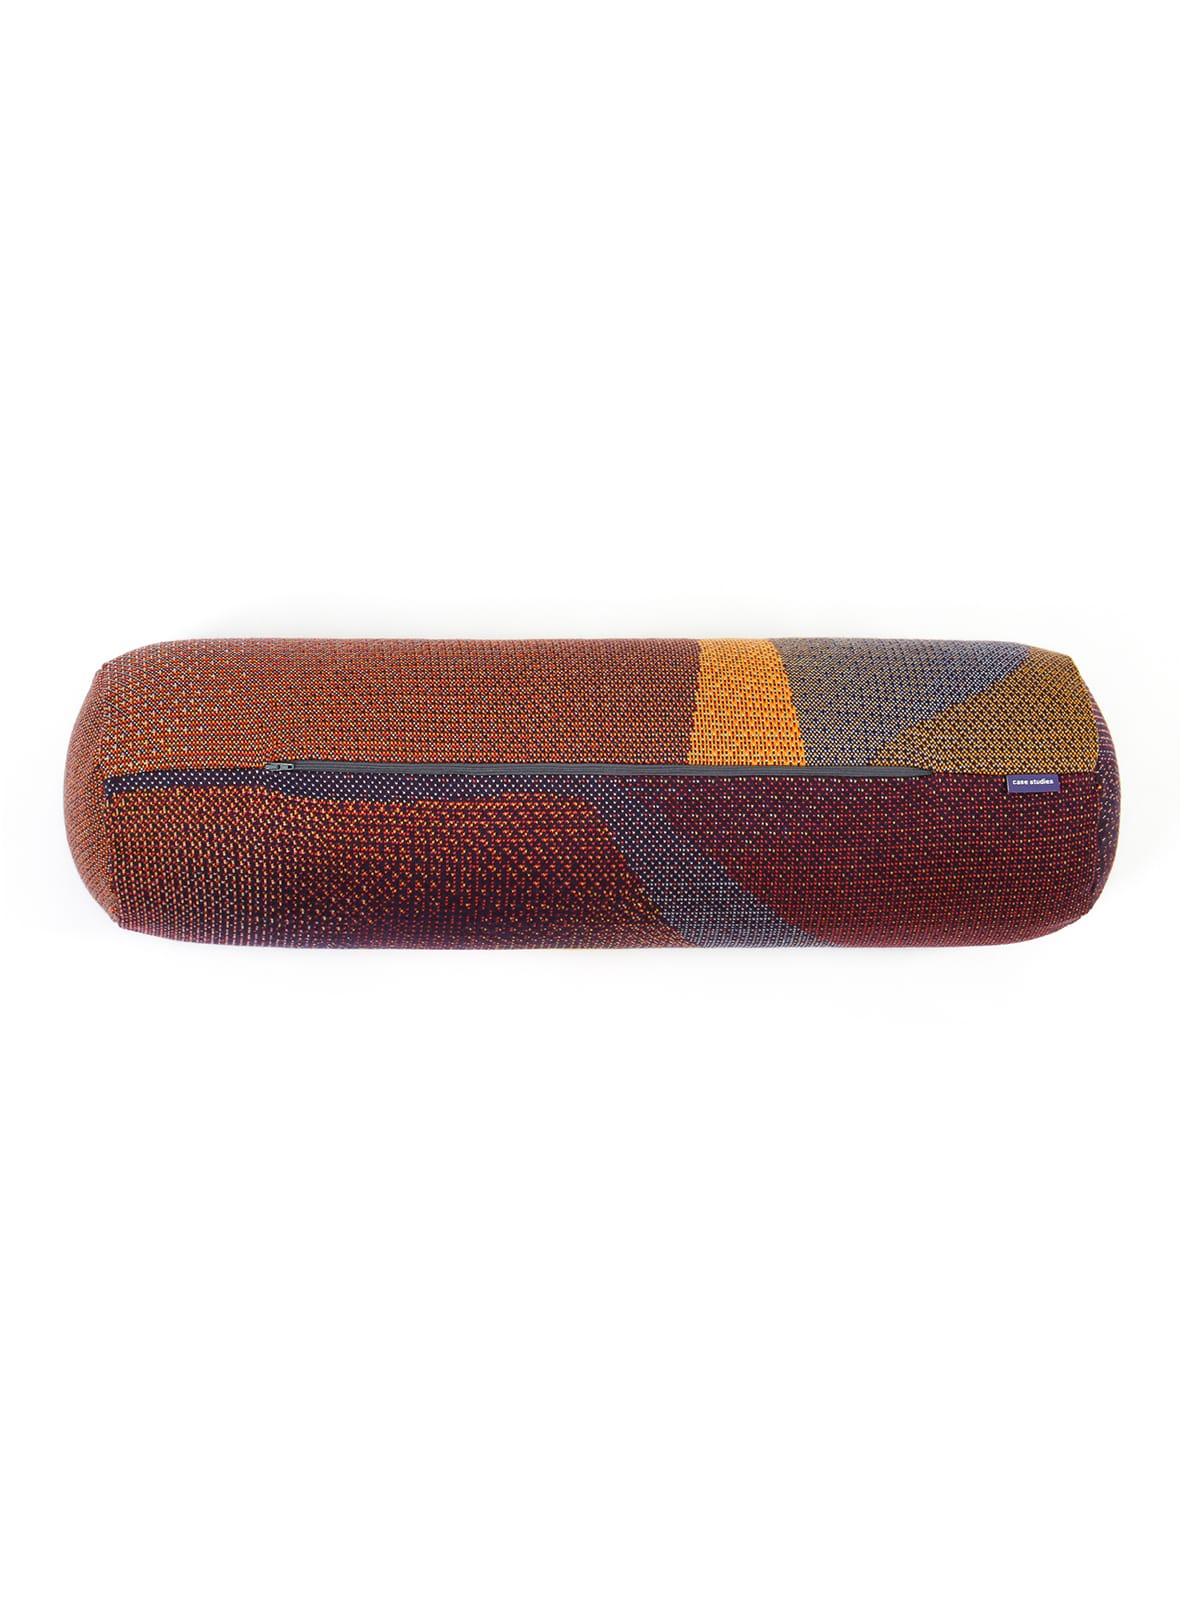 Knitted Bolster 20x70 Musselshell - Merino Wool detail